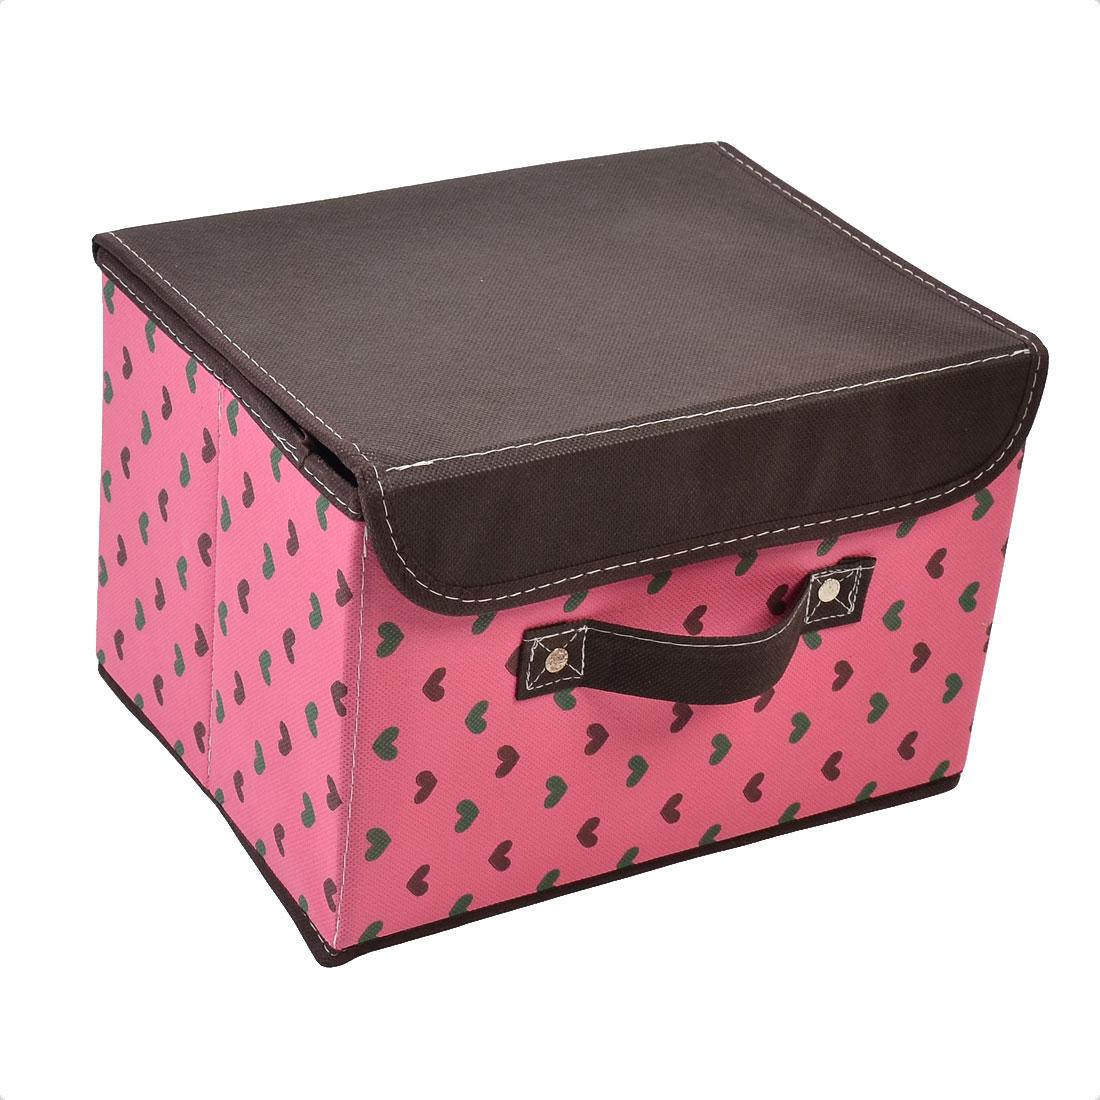 Non-woven Fabric Heart Pattern Cosmetic Makeup Storage Box Holder Brown Fuchsia